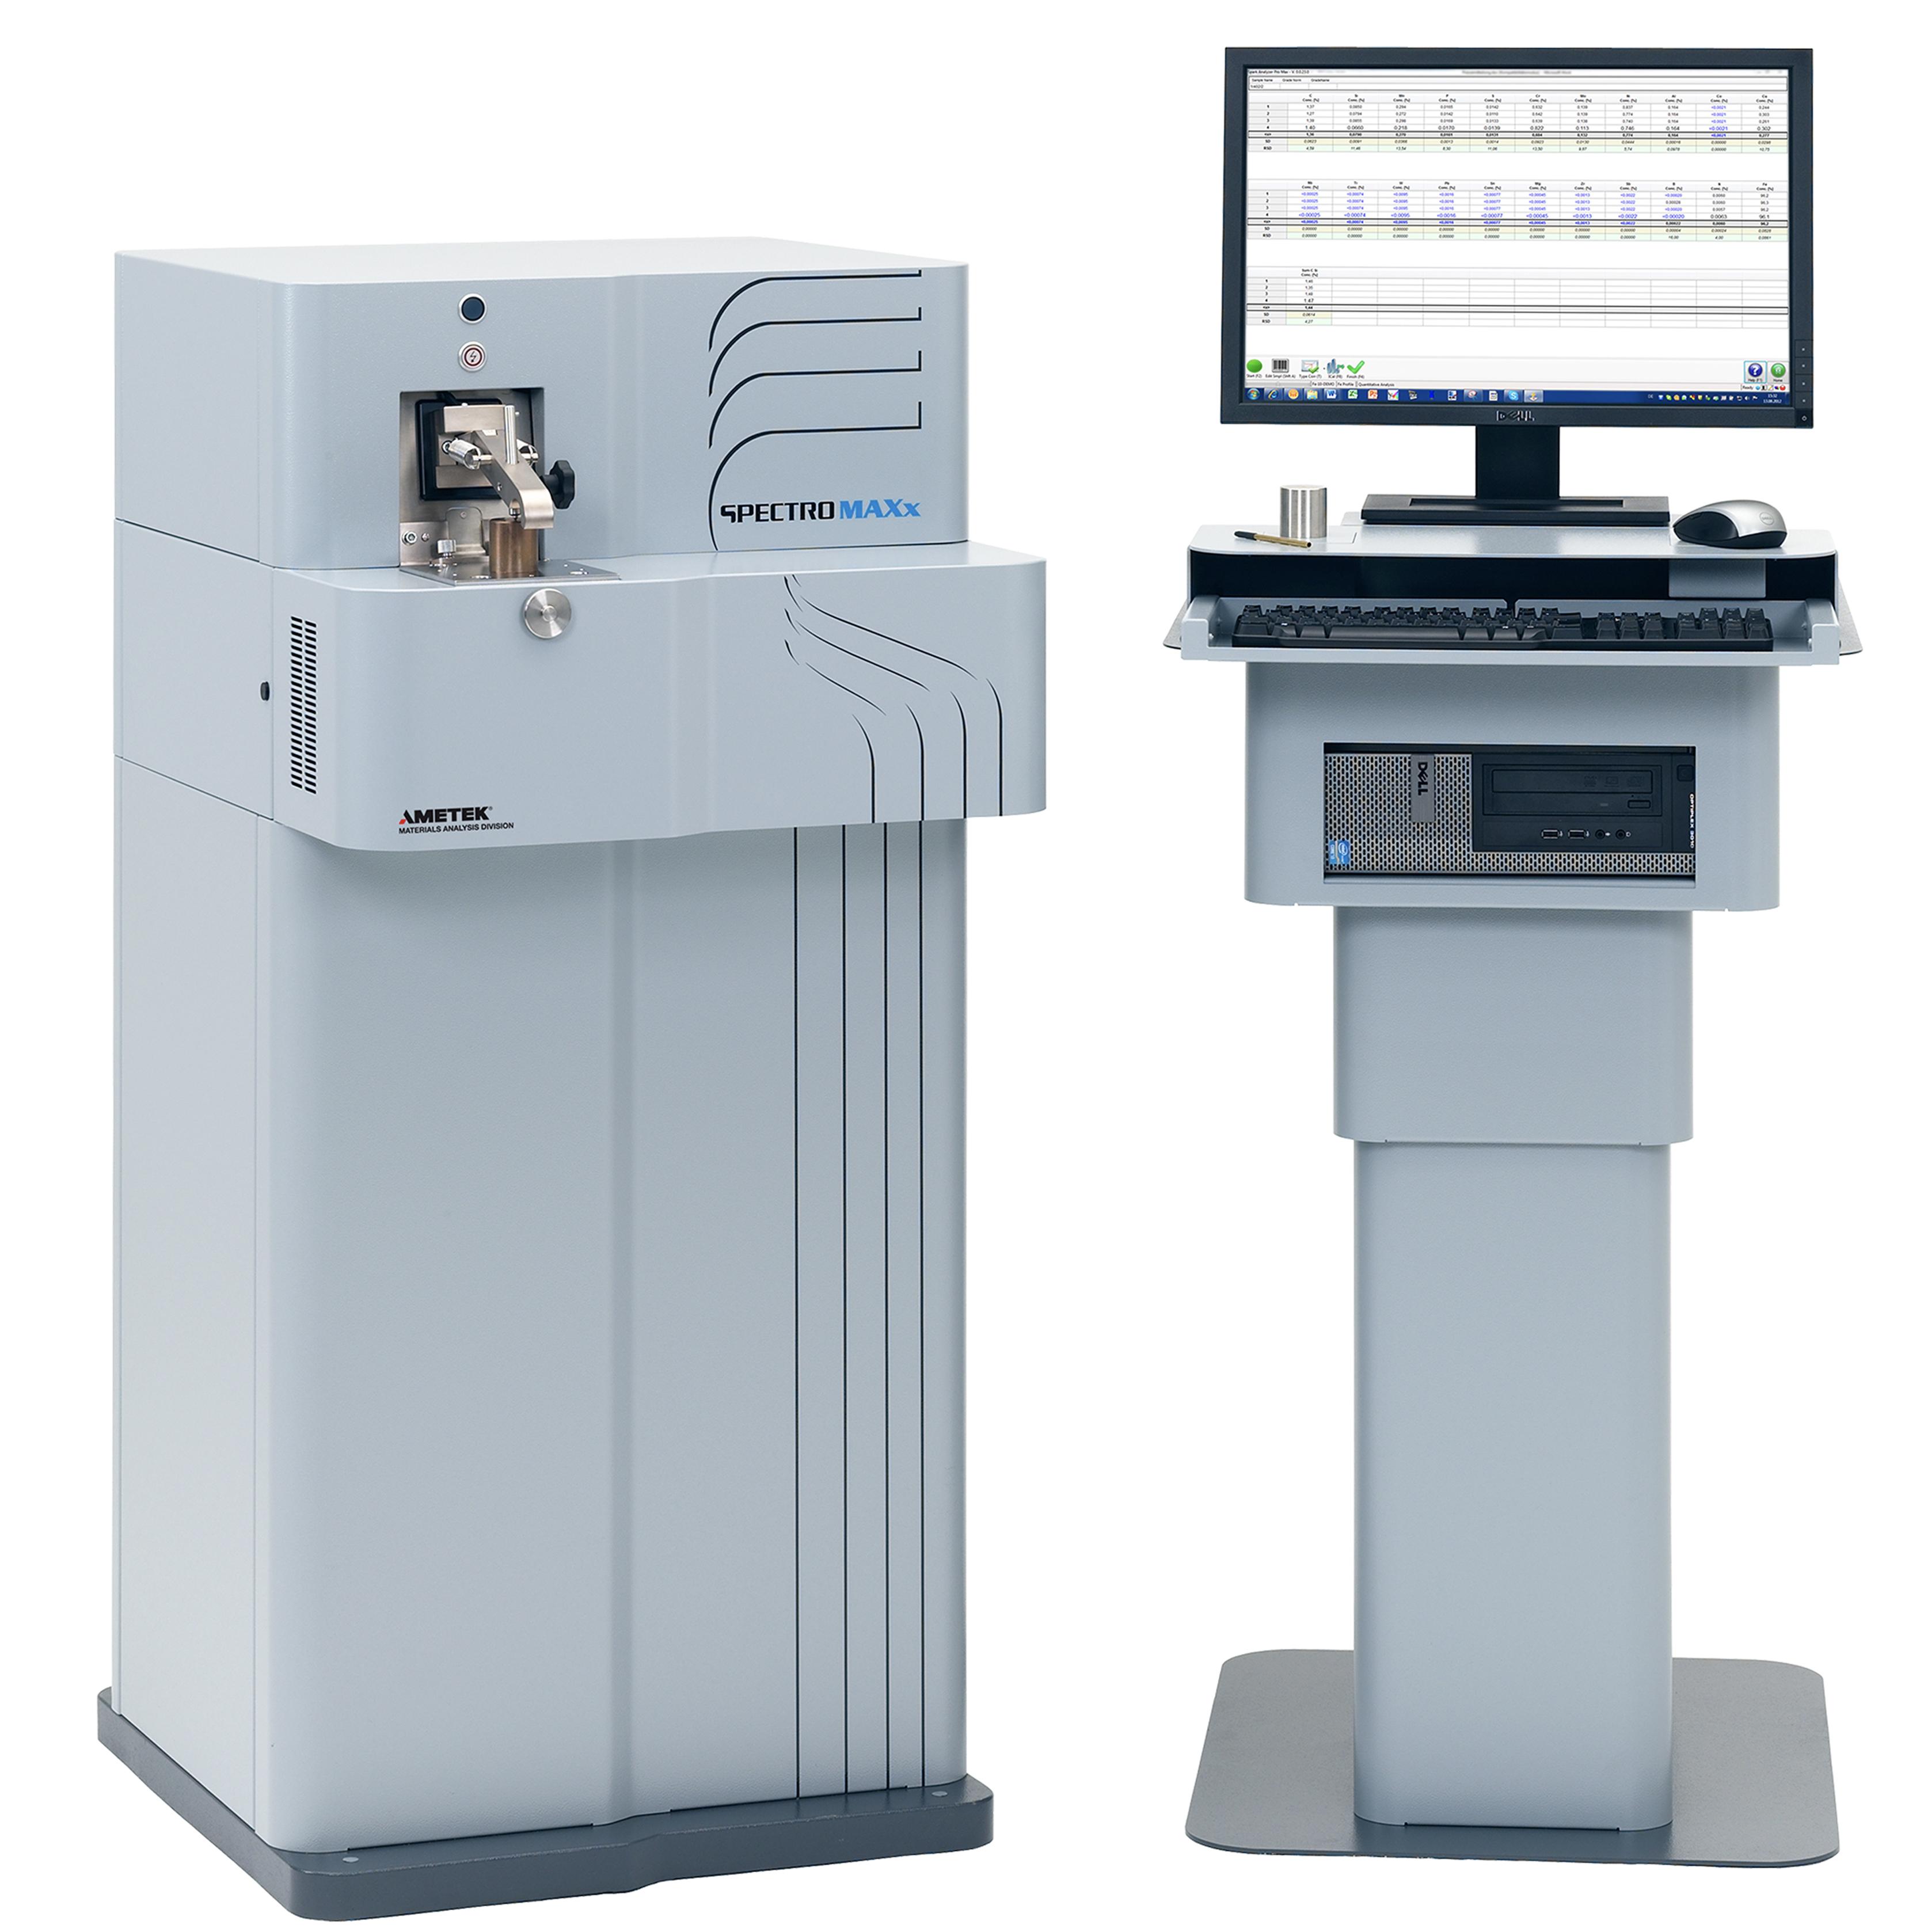 Espectrómetro Spectromaxx